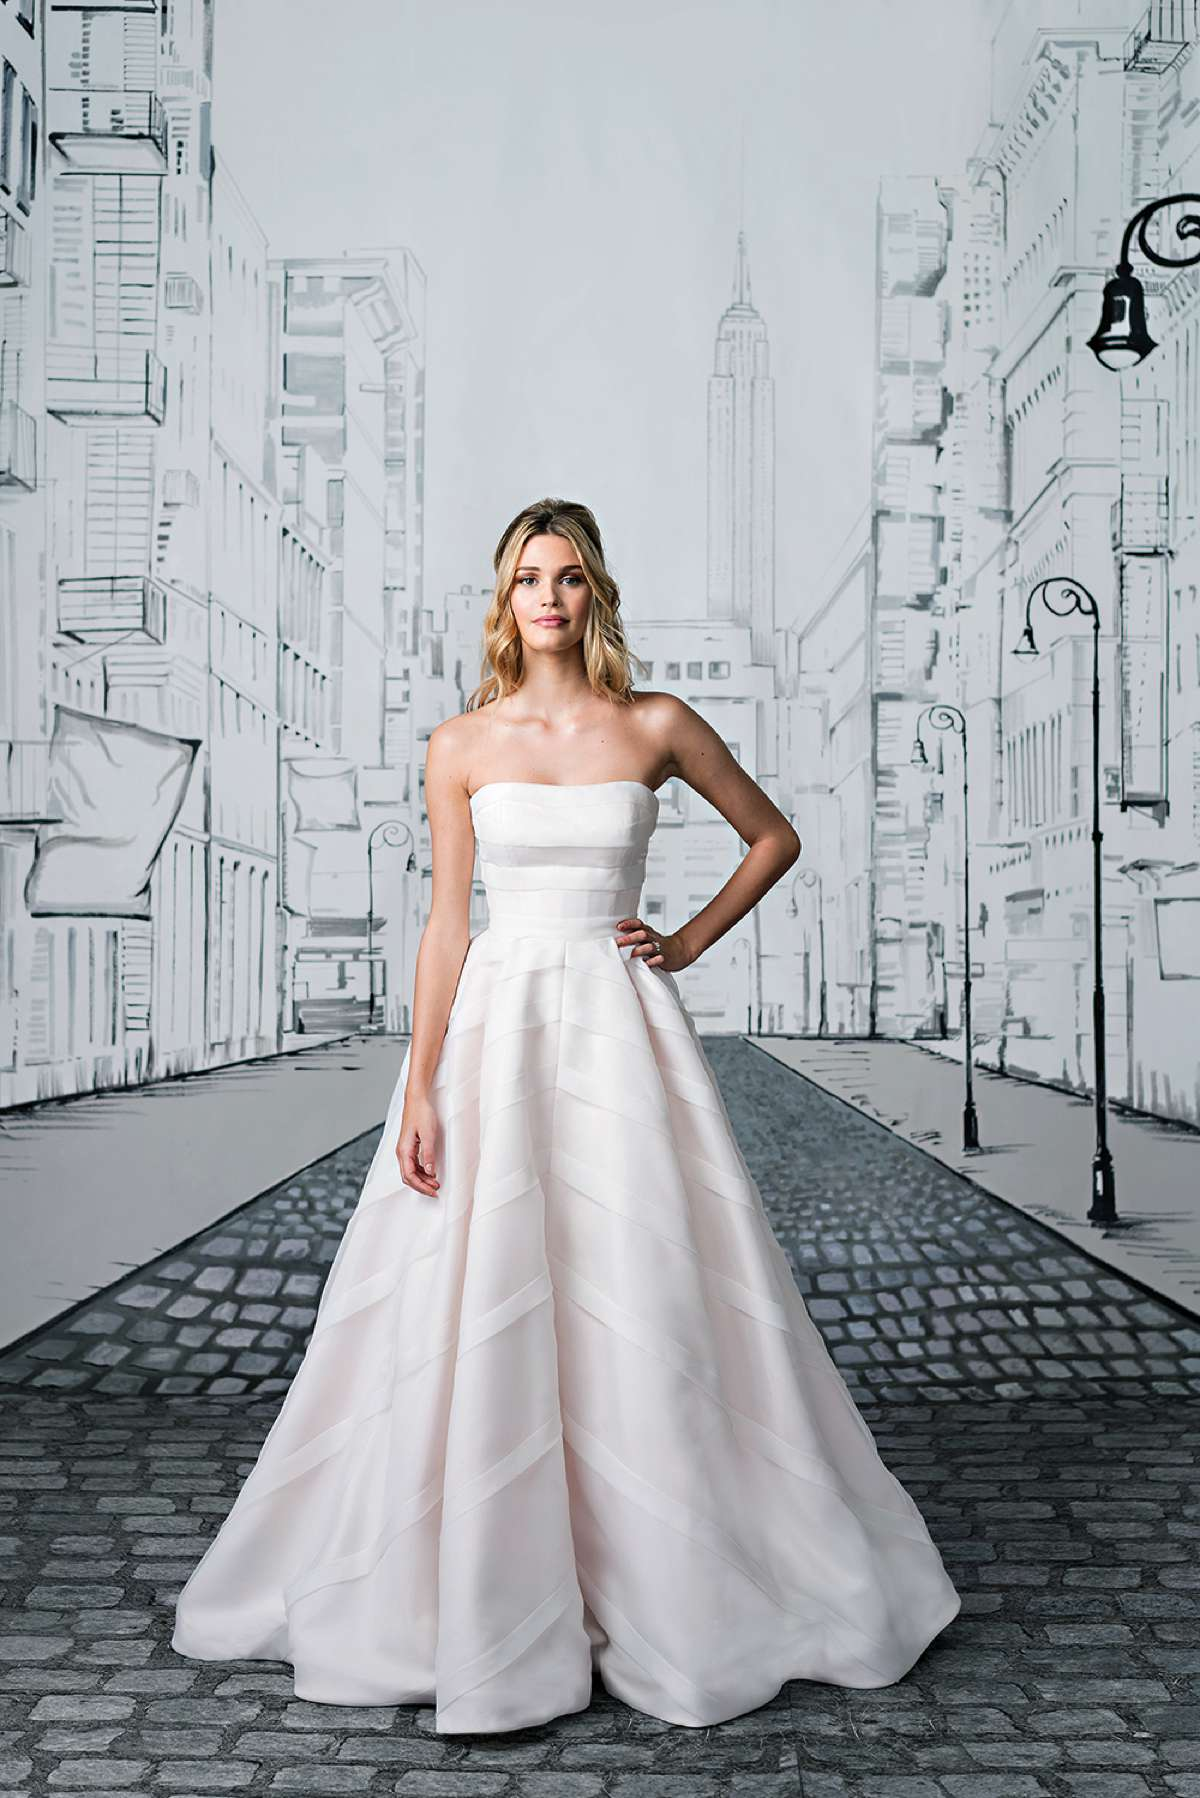 WIN a Justin Alexander wedding dress! - Love Our Wedding